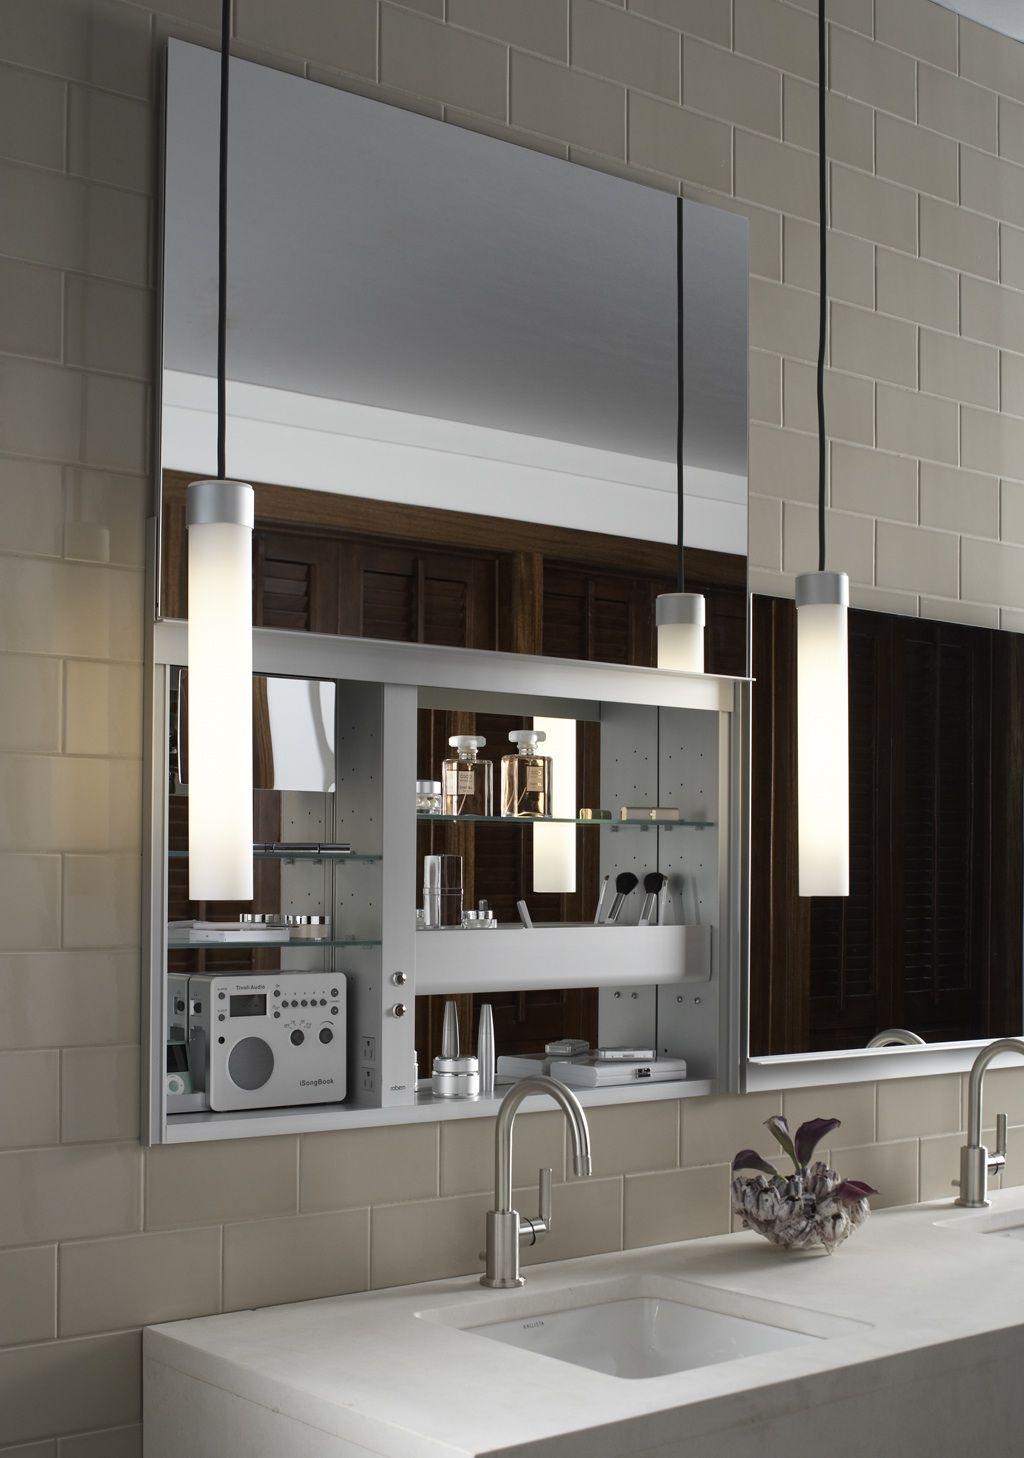 Elegant Recessed Bathroom Medicine Cabinets With Lights  Home Design Ideas